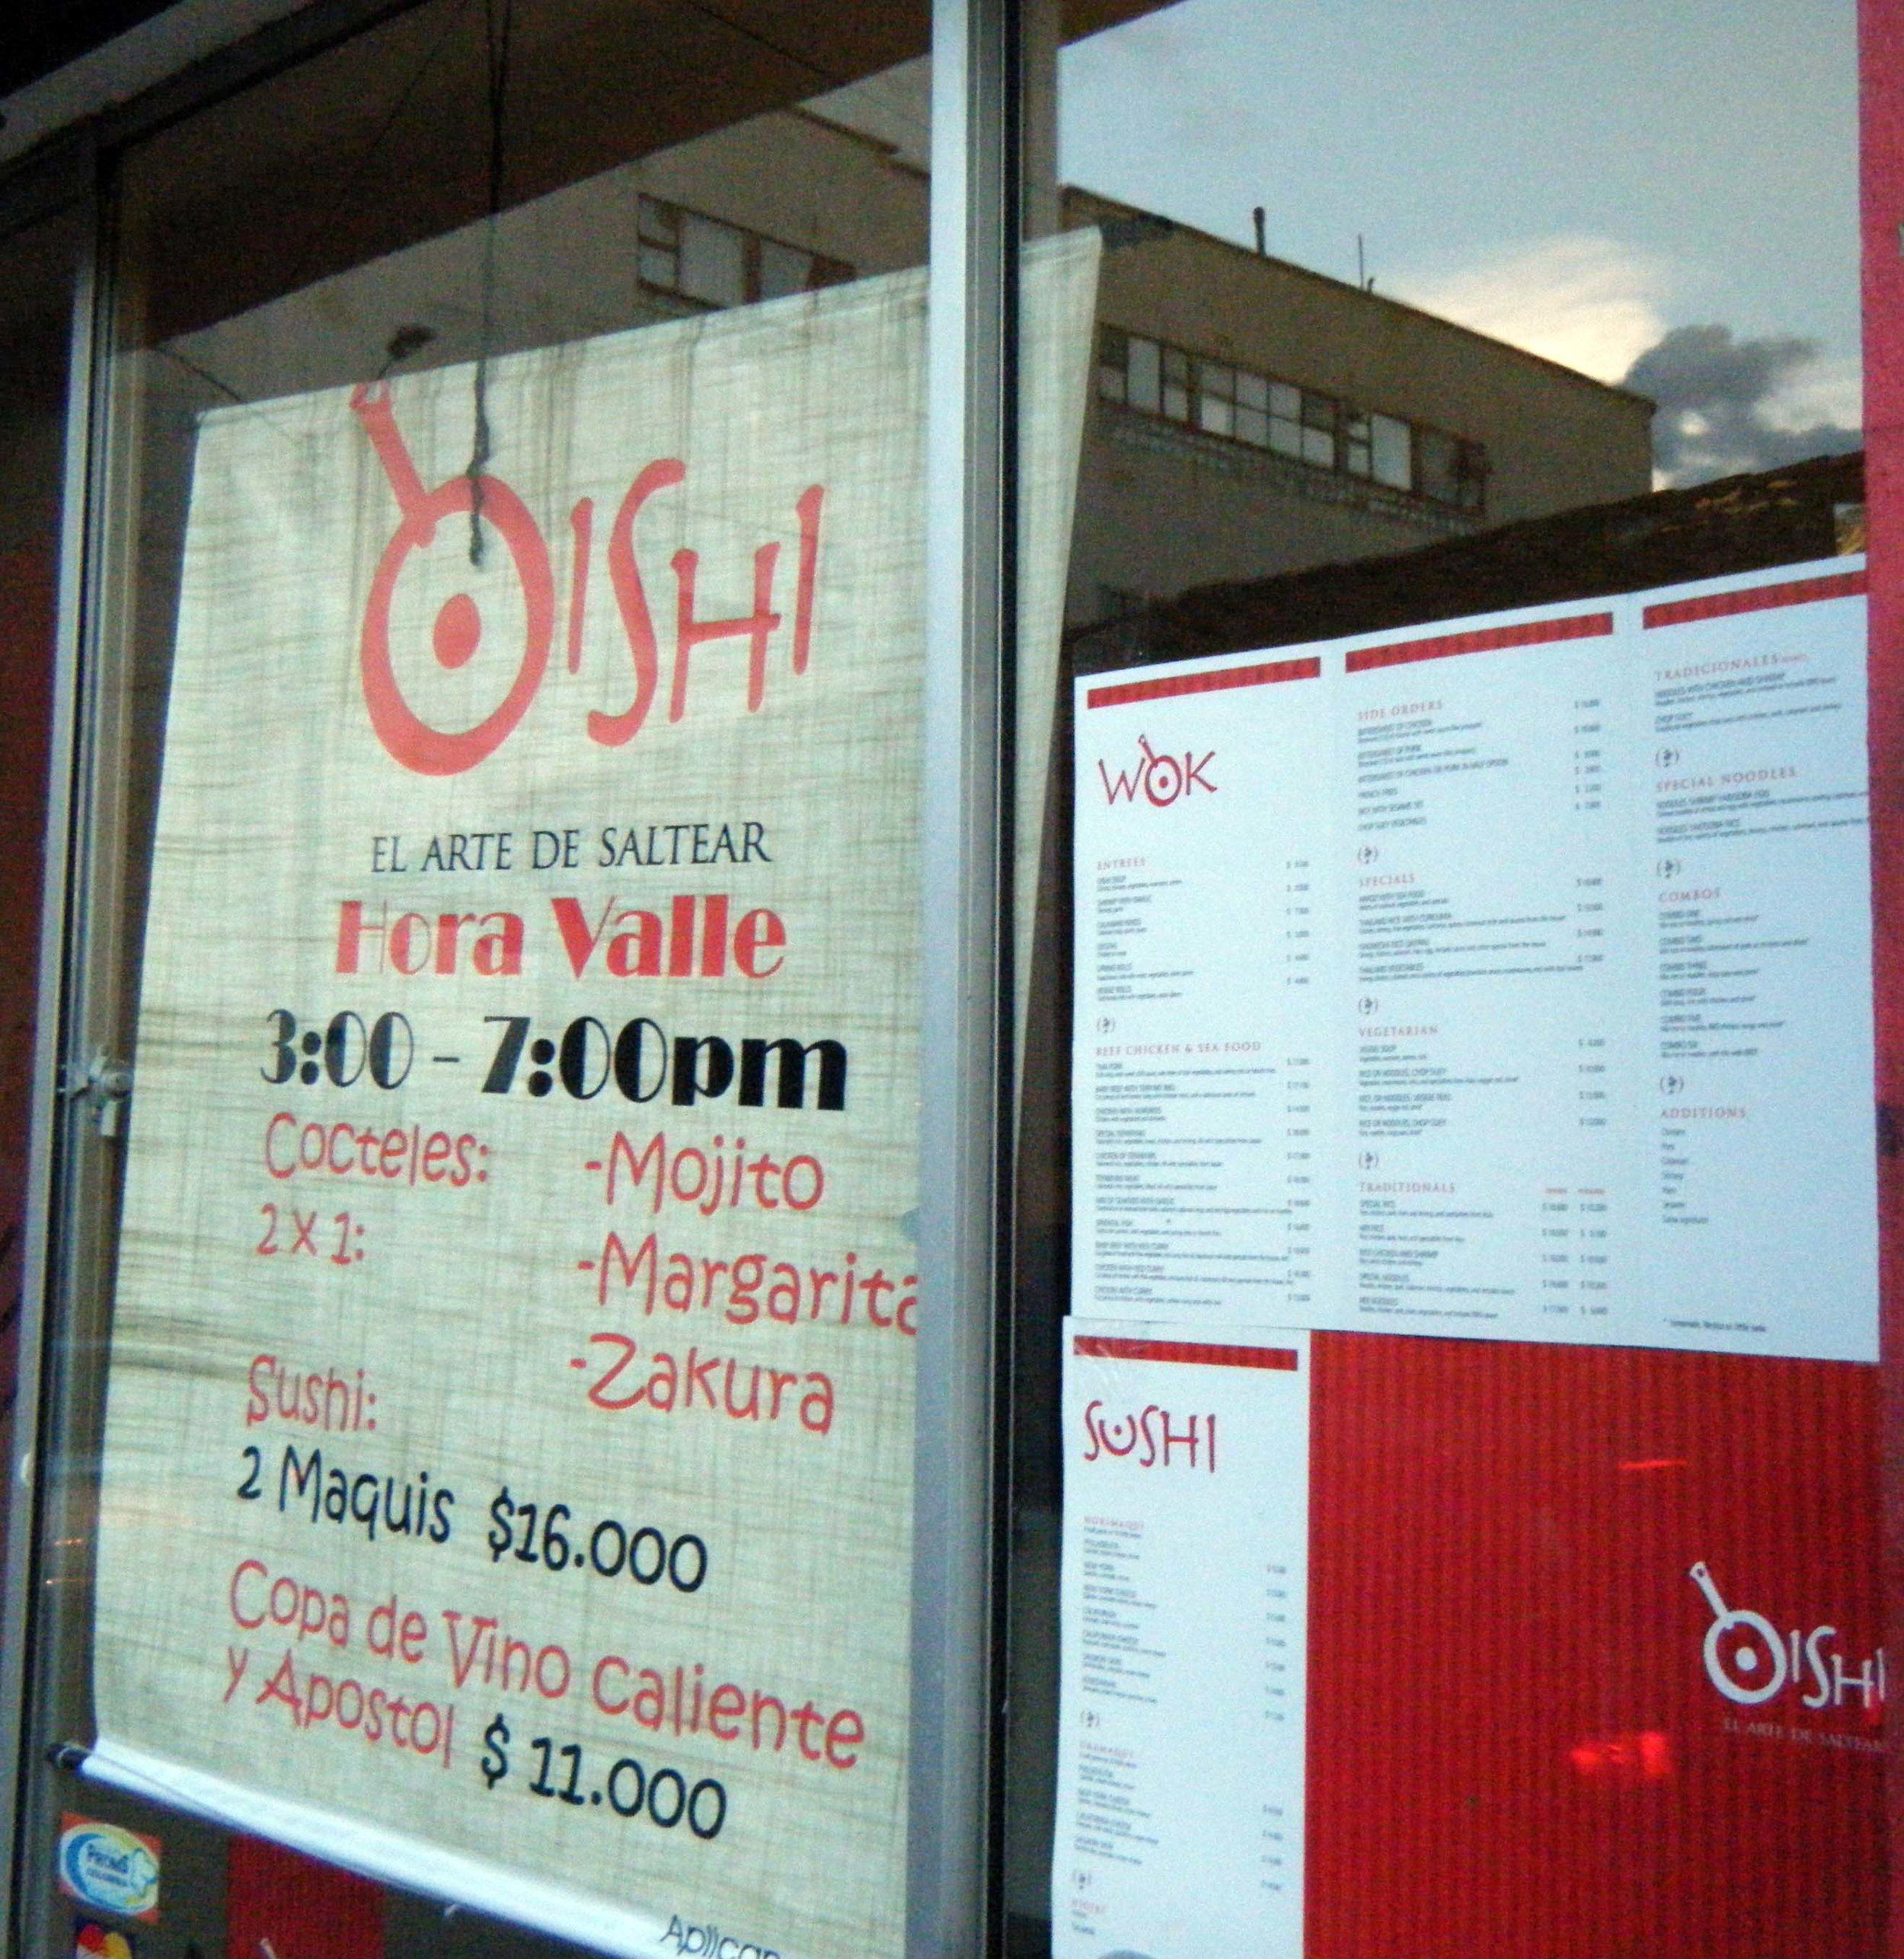 Oishi Sushi.jpg